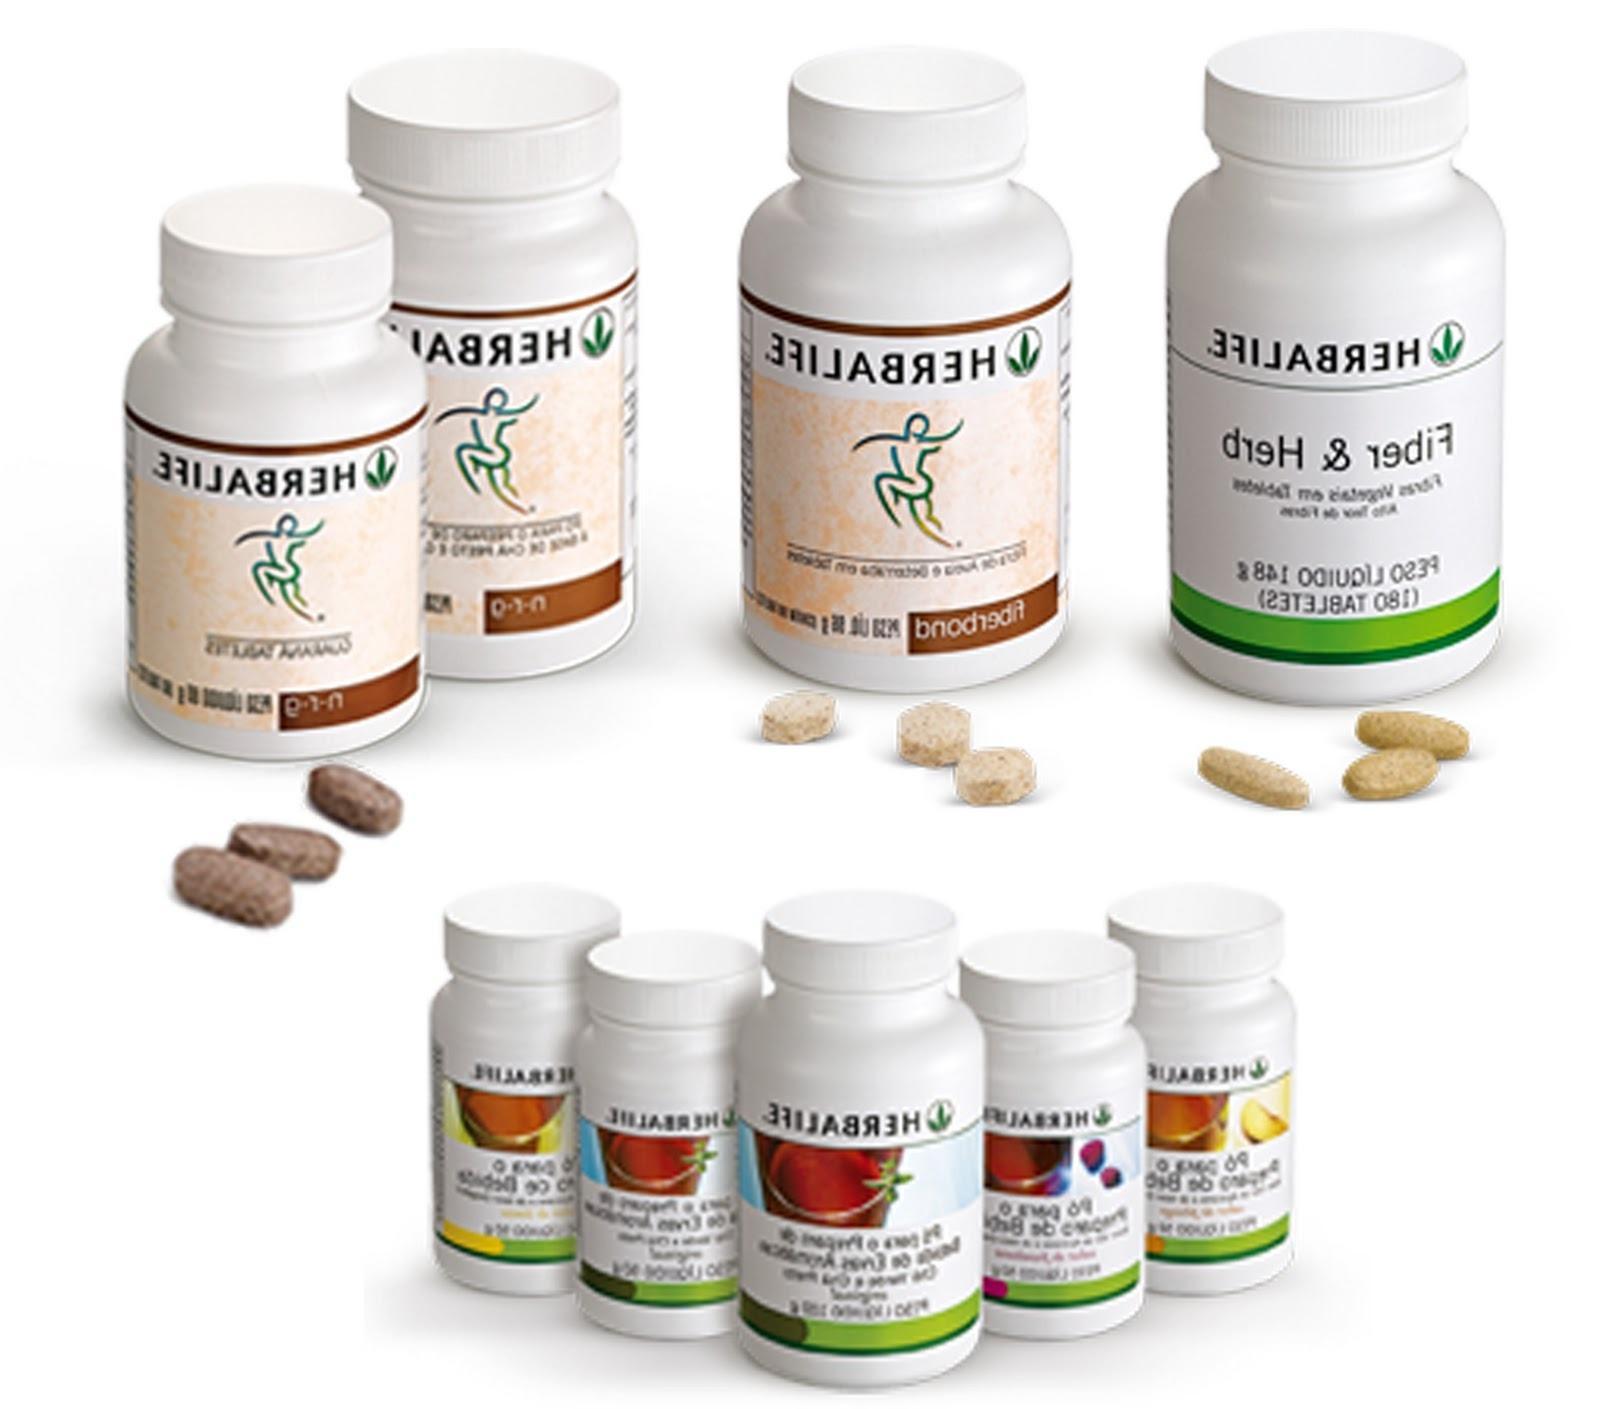 Efeitos Adversos dos Produtos Herbalife